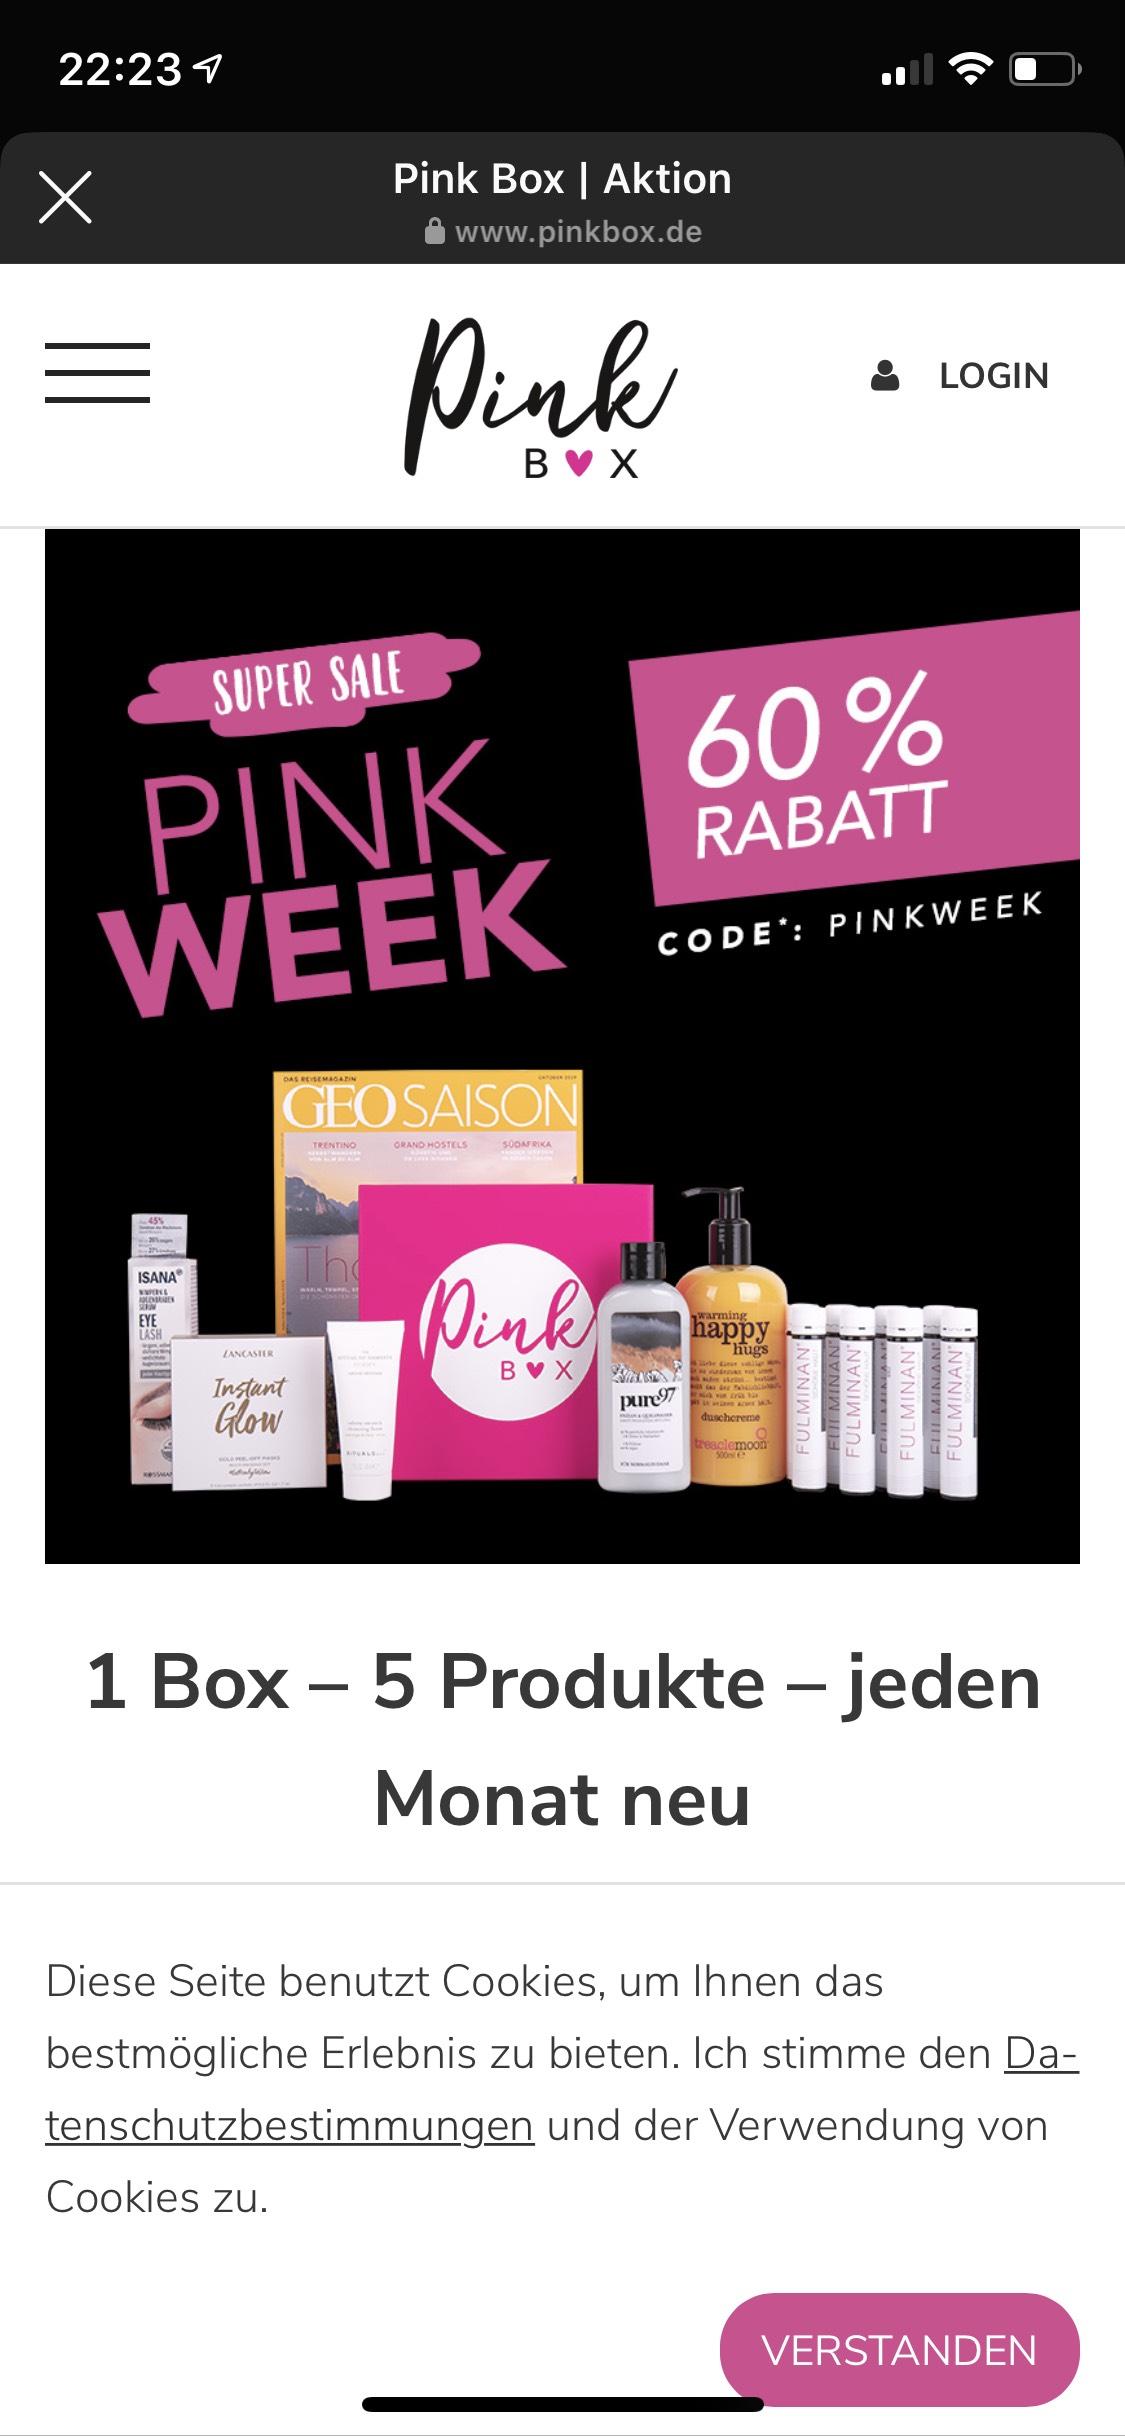 Beautybox Pink Box mit 60% Rabatt